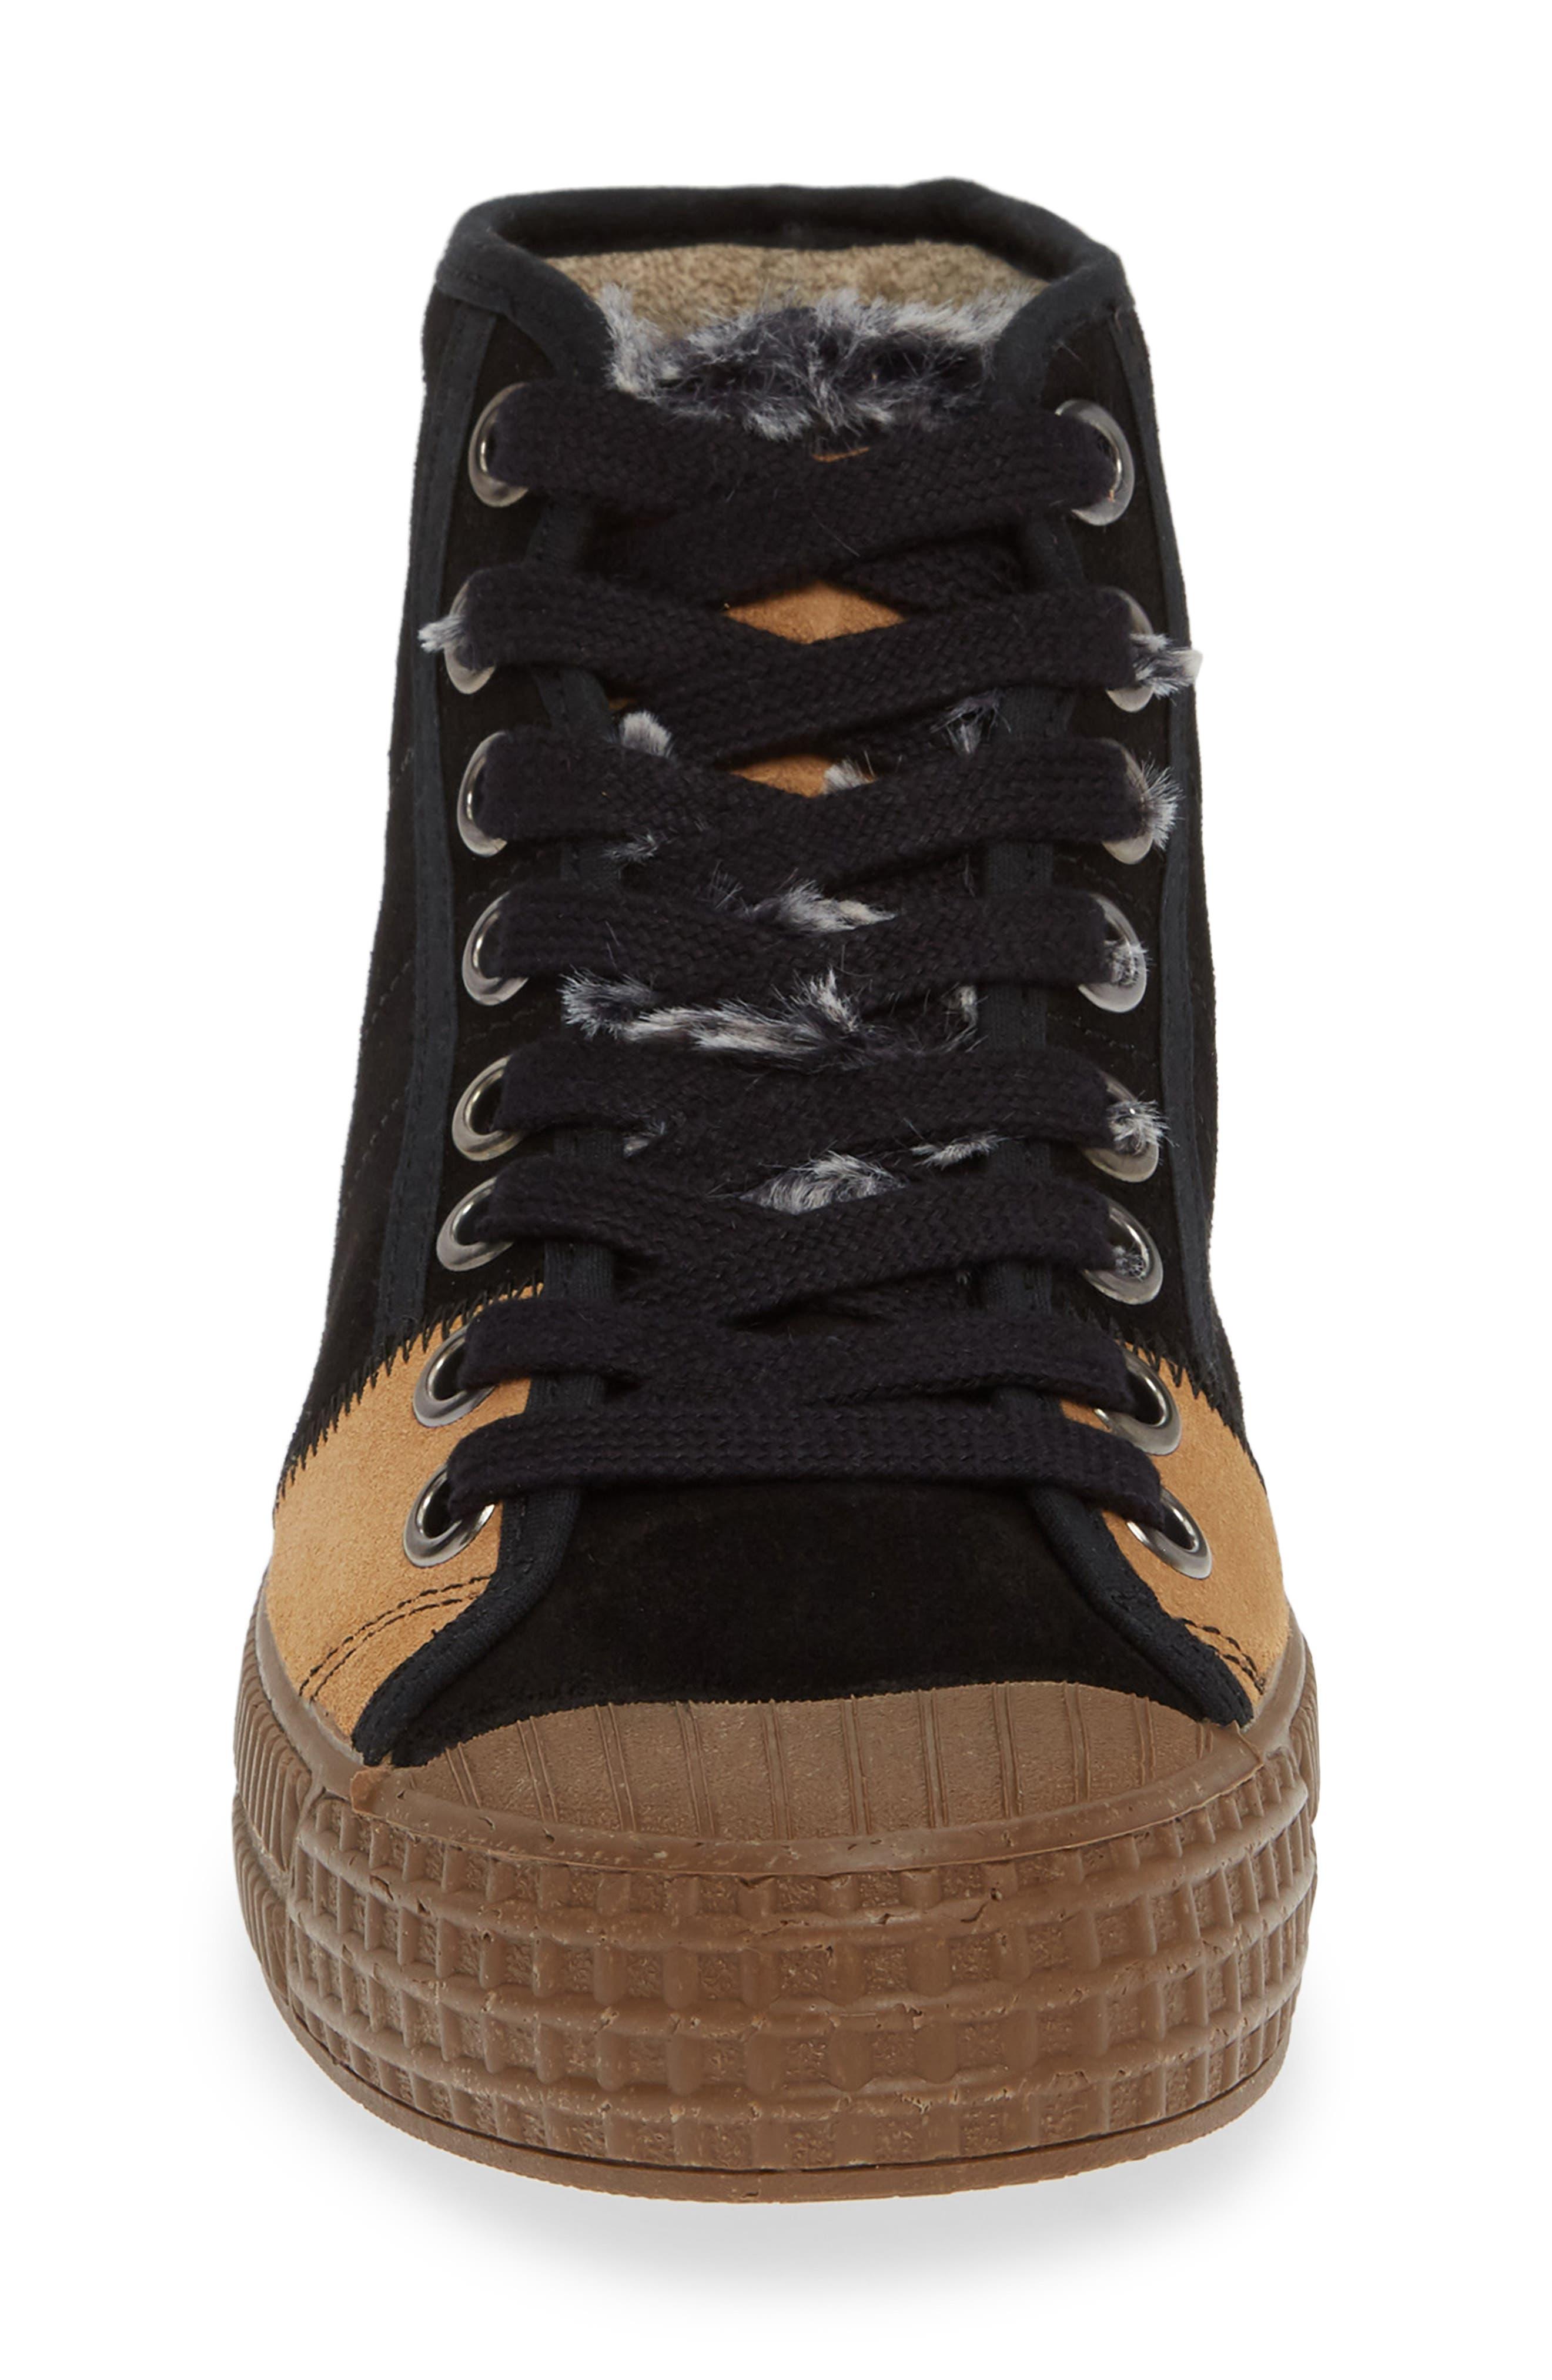 Femp High Top Sneaker,                             Alternate thumbnail 4, color,                             BLACK/ CAMEL SUEDE